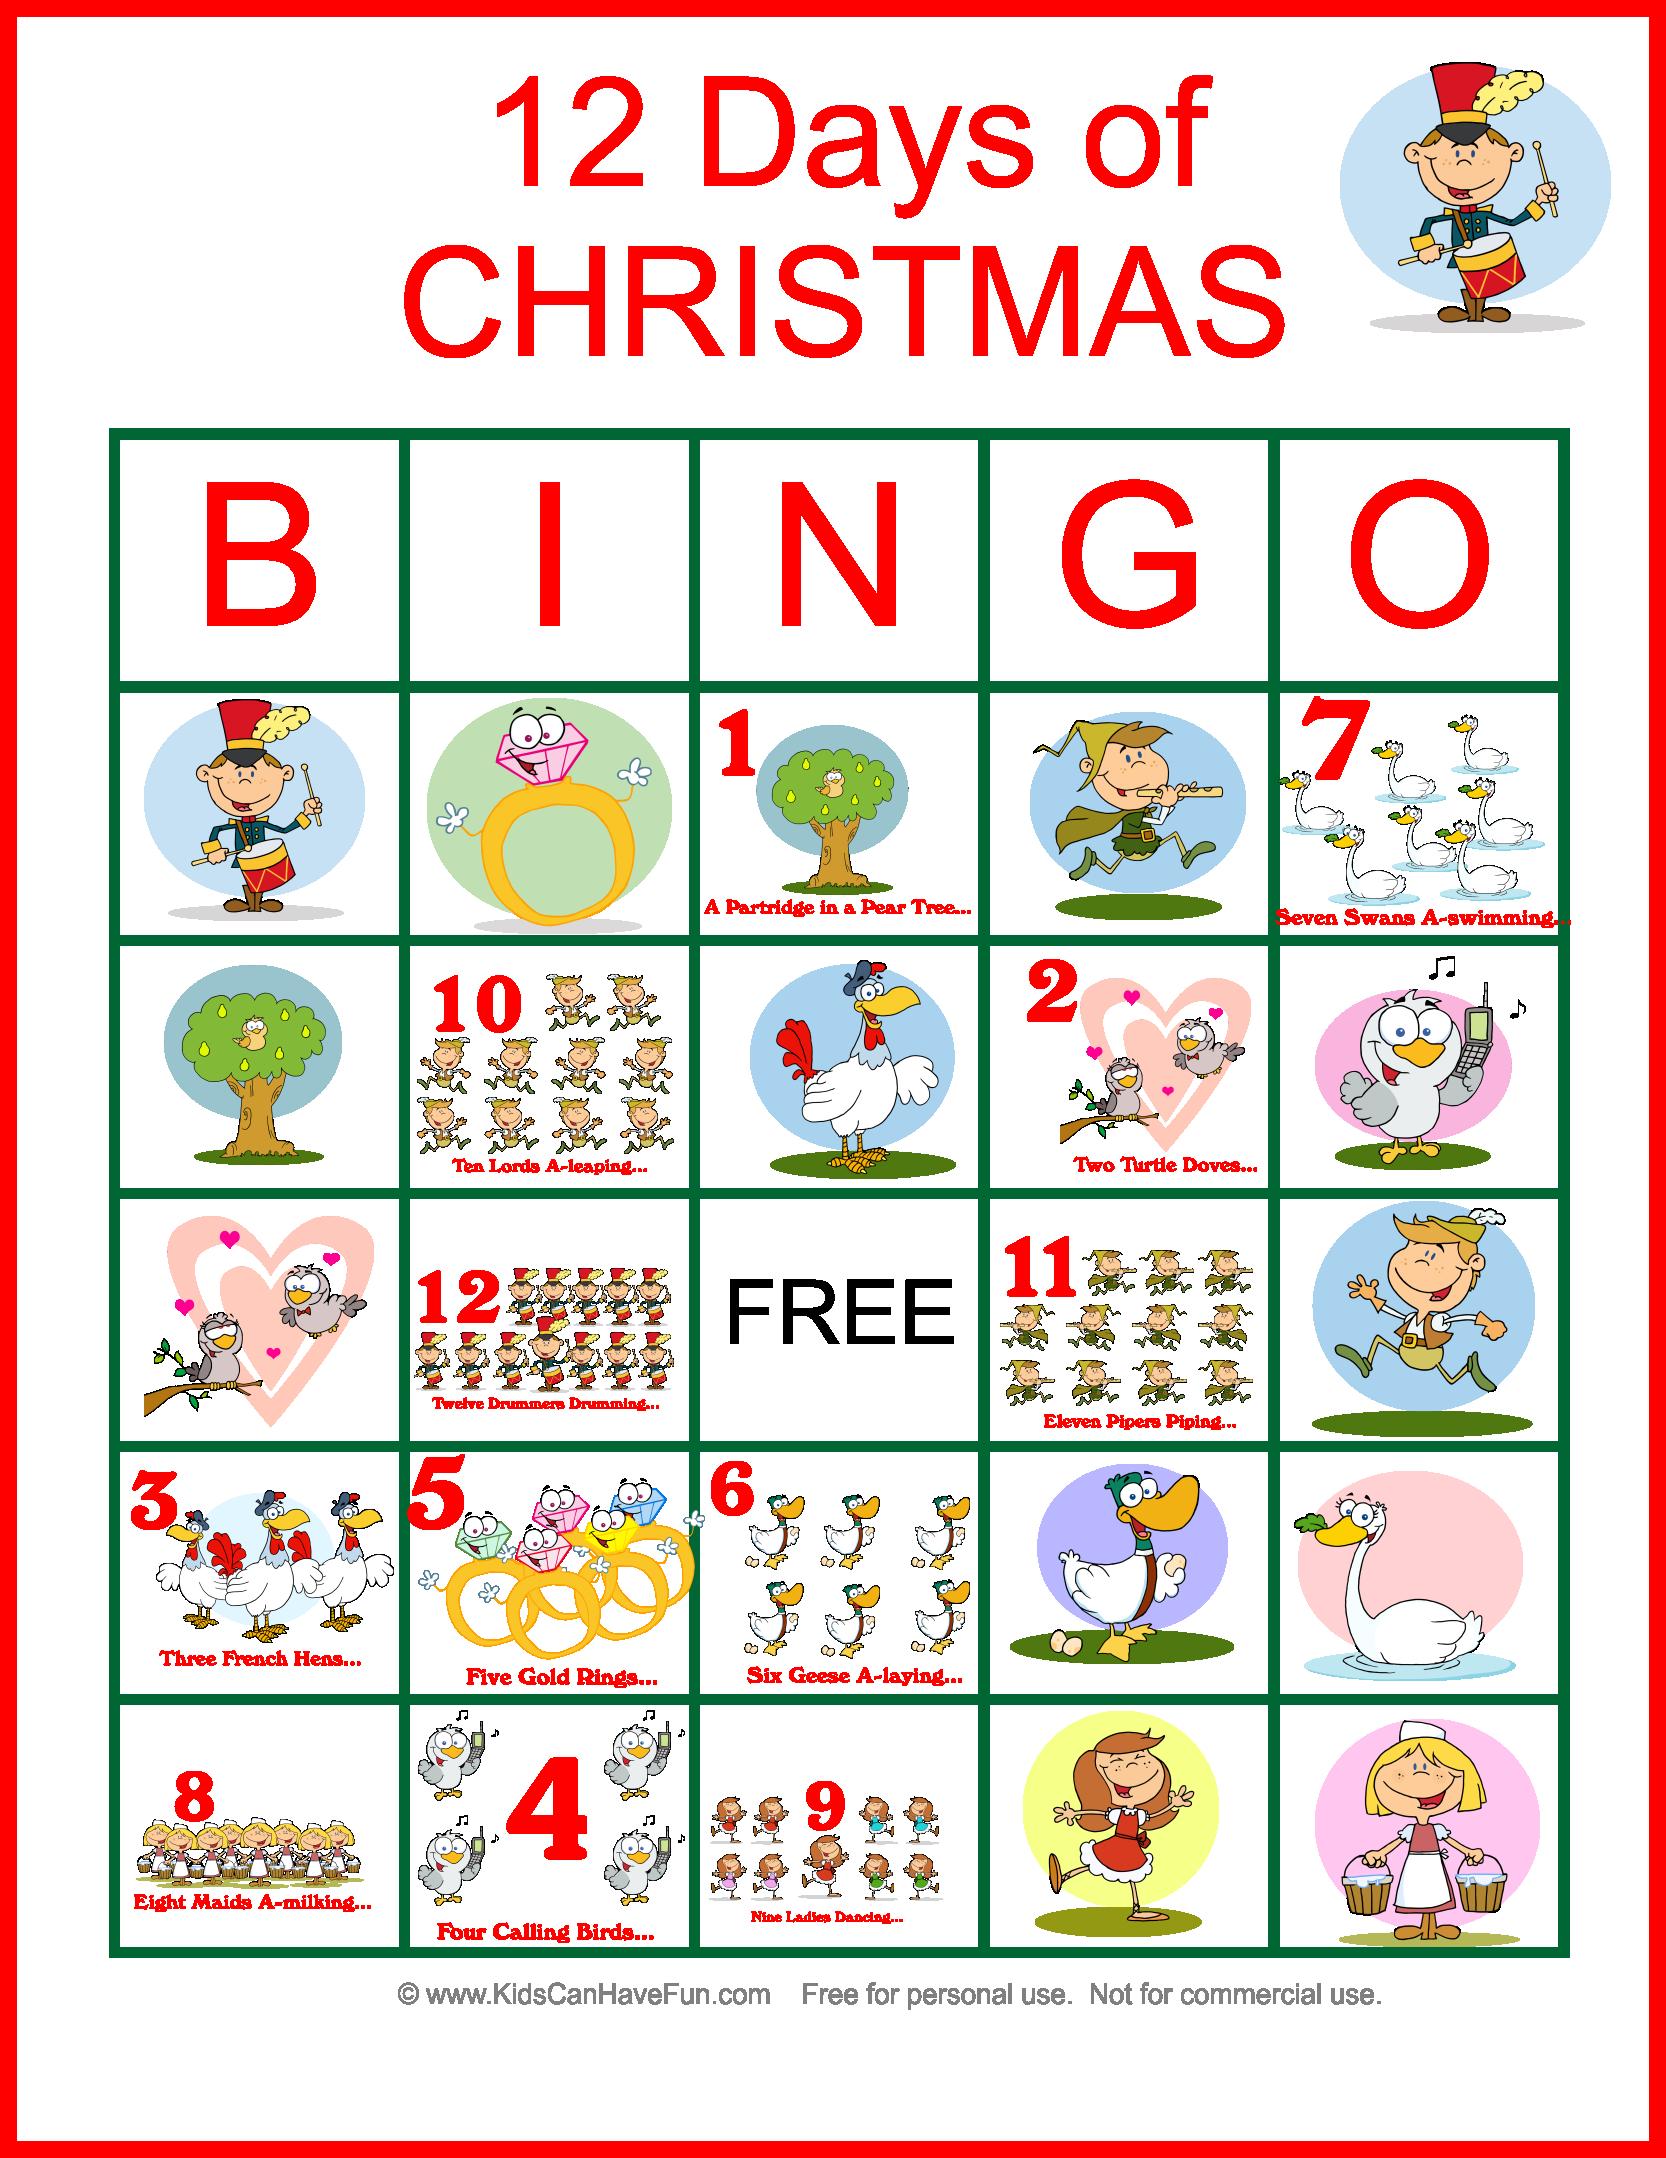 Twelve Days Of Christmas Bingo For The Whole Family Dscanhavefun Twelve Days